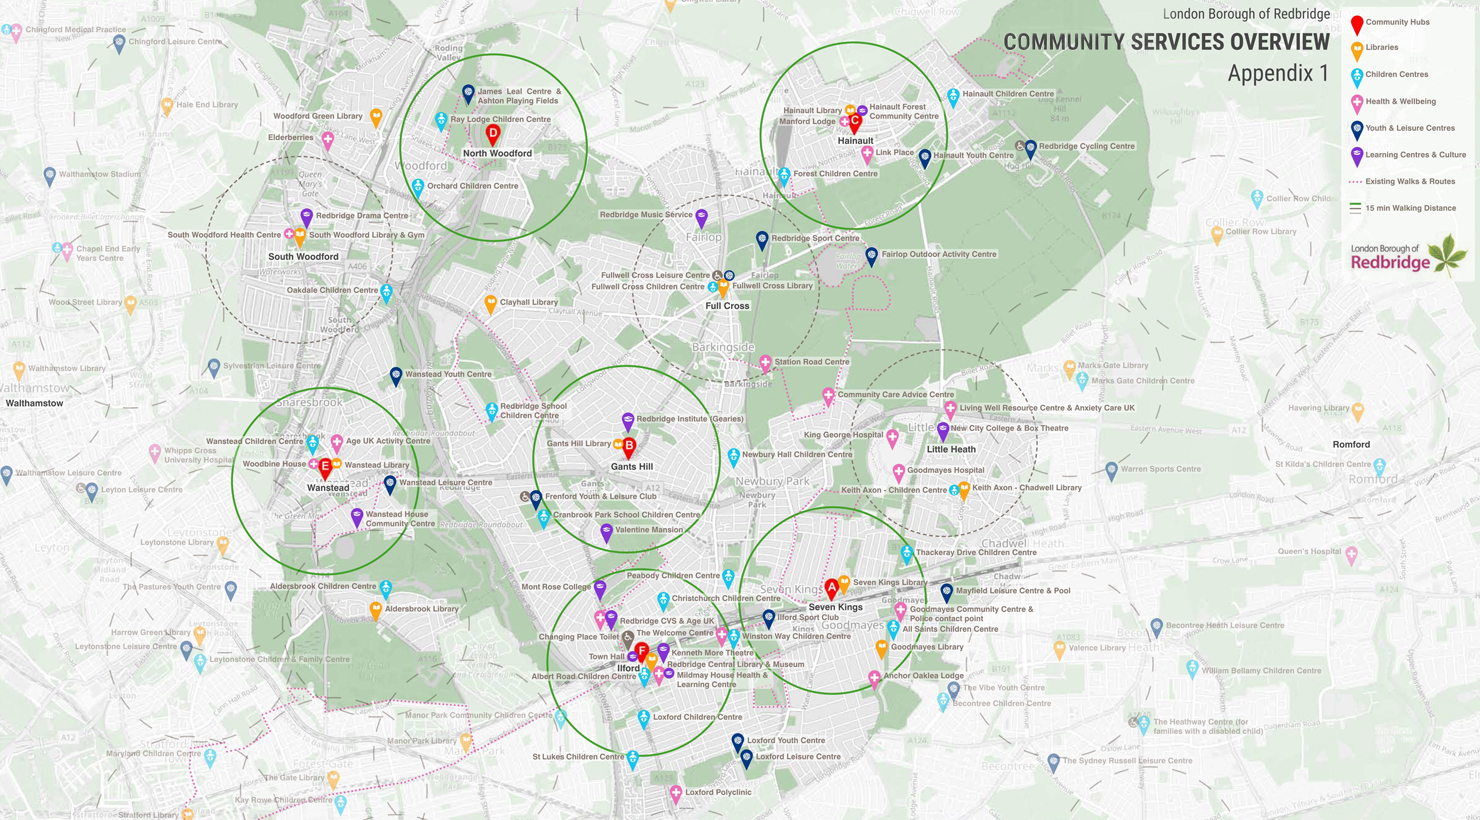 698 - Redbridge - 1 - community services map